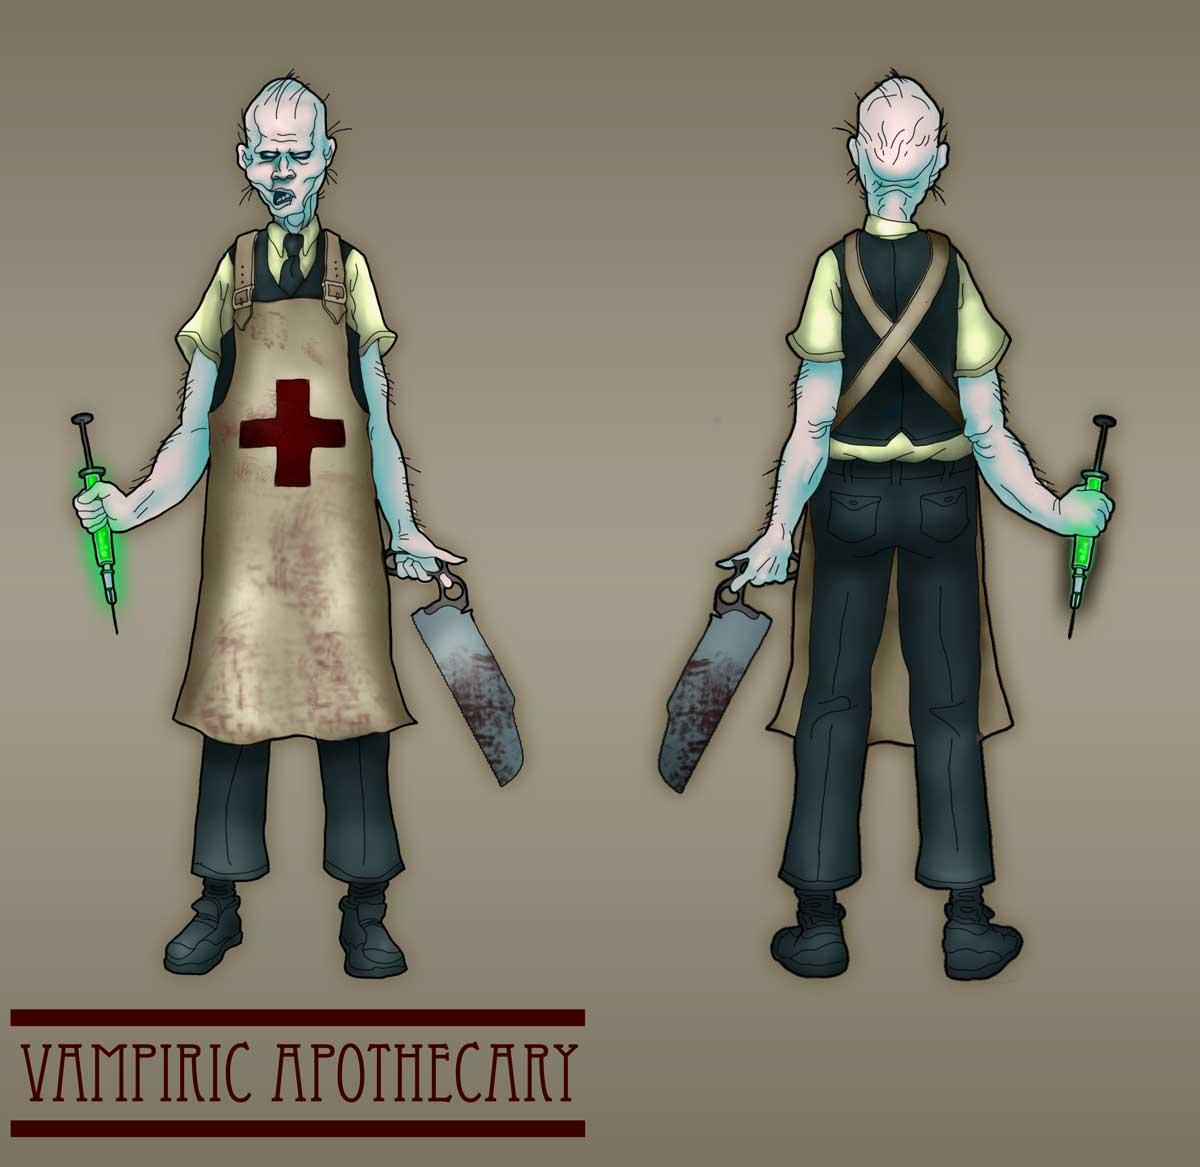 Vampiric Apothecary